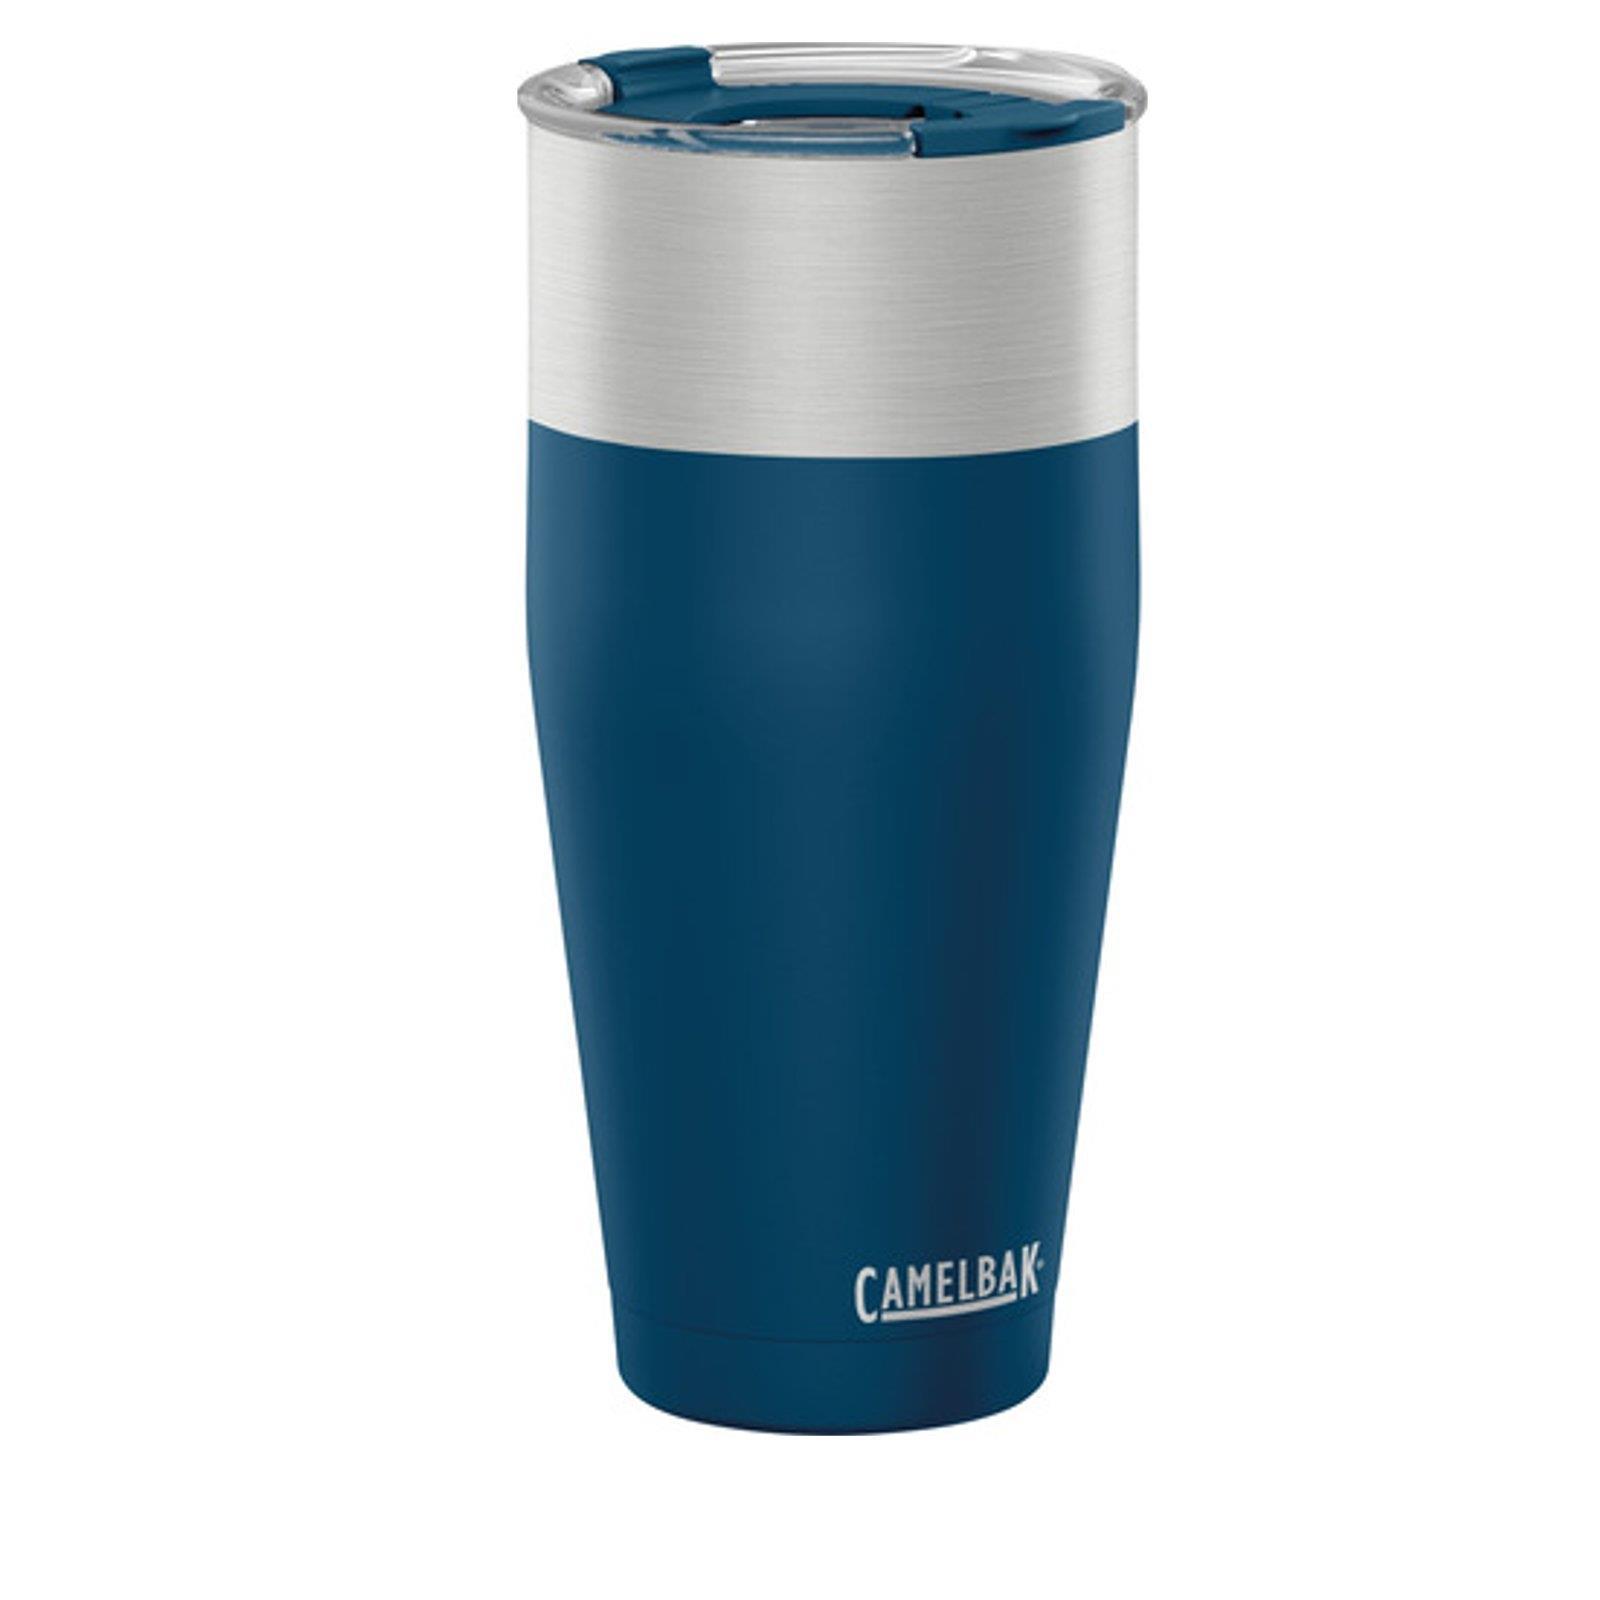 Camelbak-Kickbak-Edelstahl-Thermo-Trink-Auto-Becher-600ml-900ml-Isoliert-Kaffee Indexbild 2